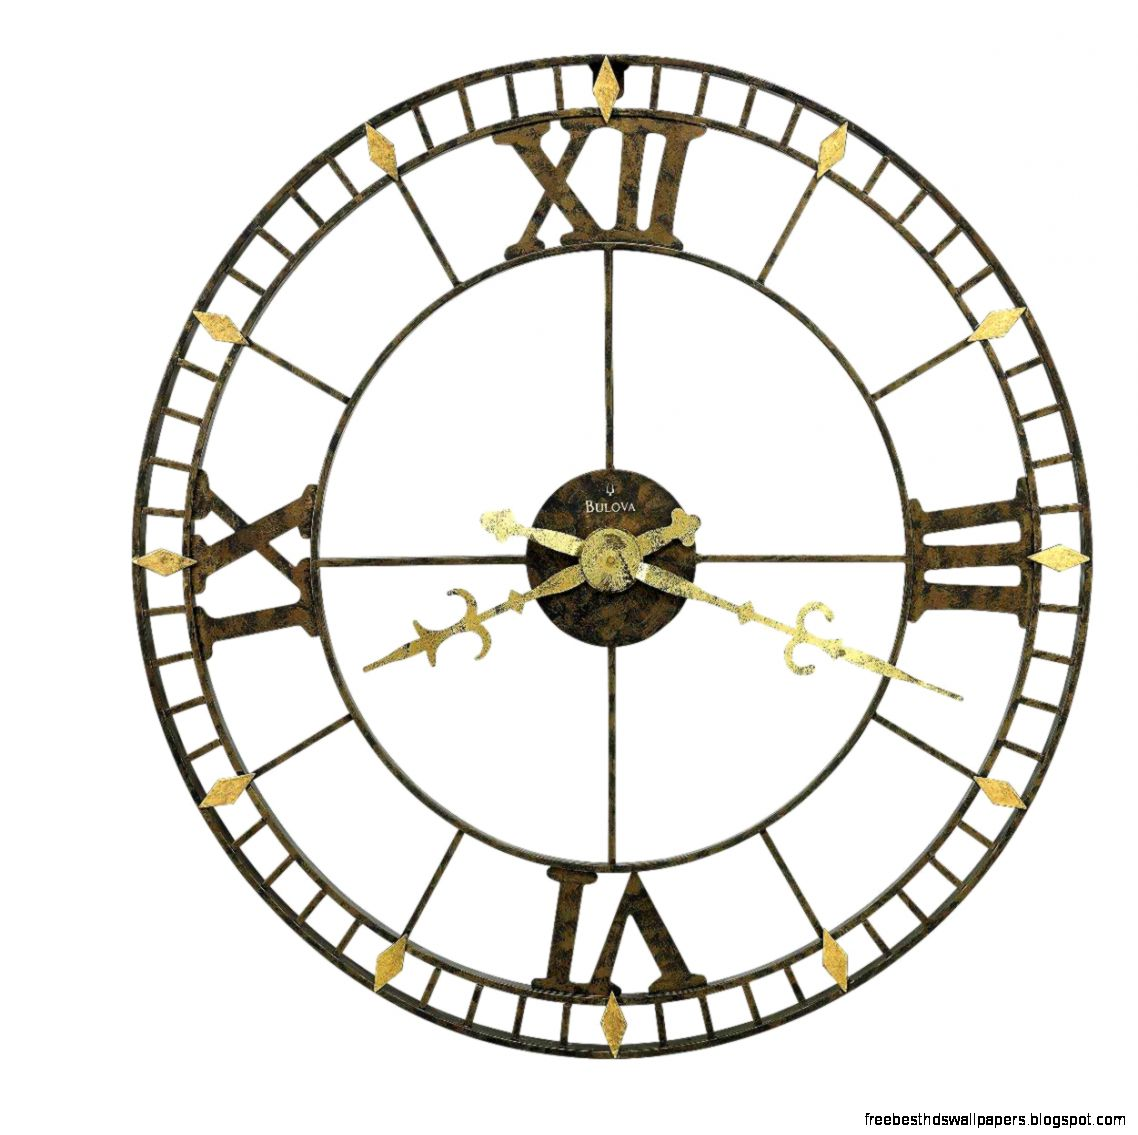 Funky Wall Clock Free Best Hd Wallpapers